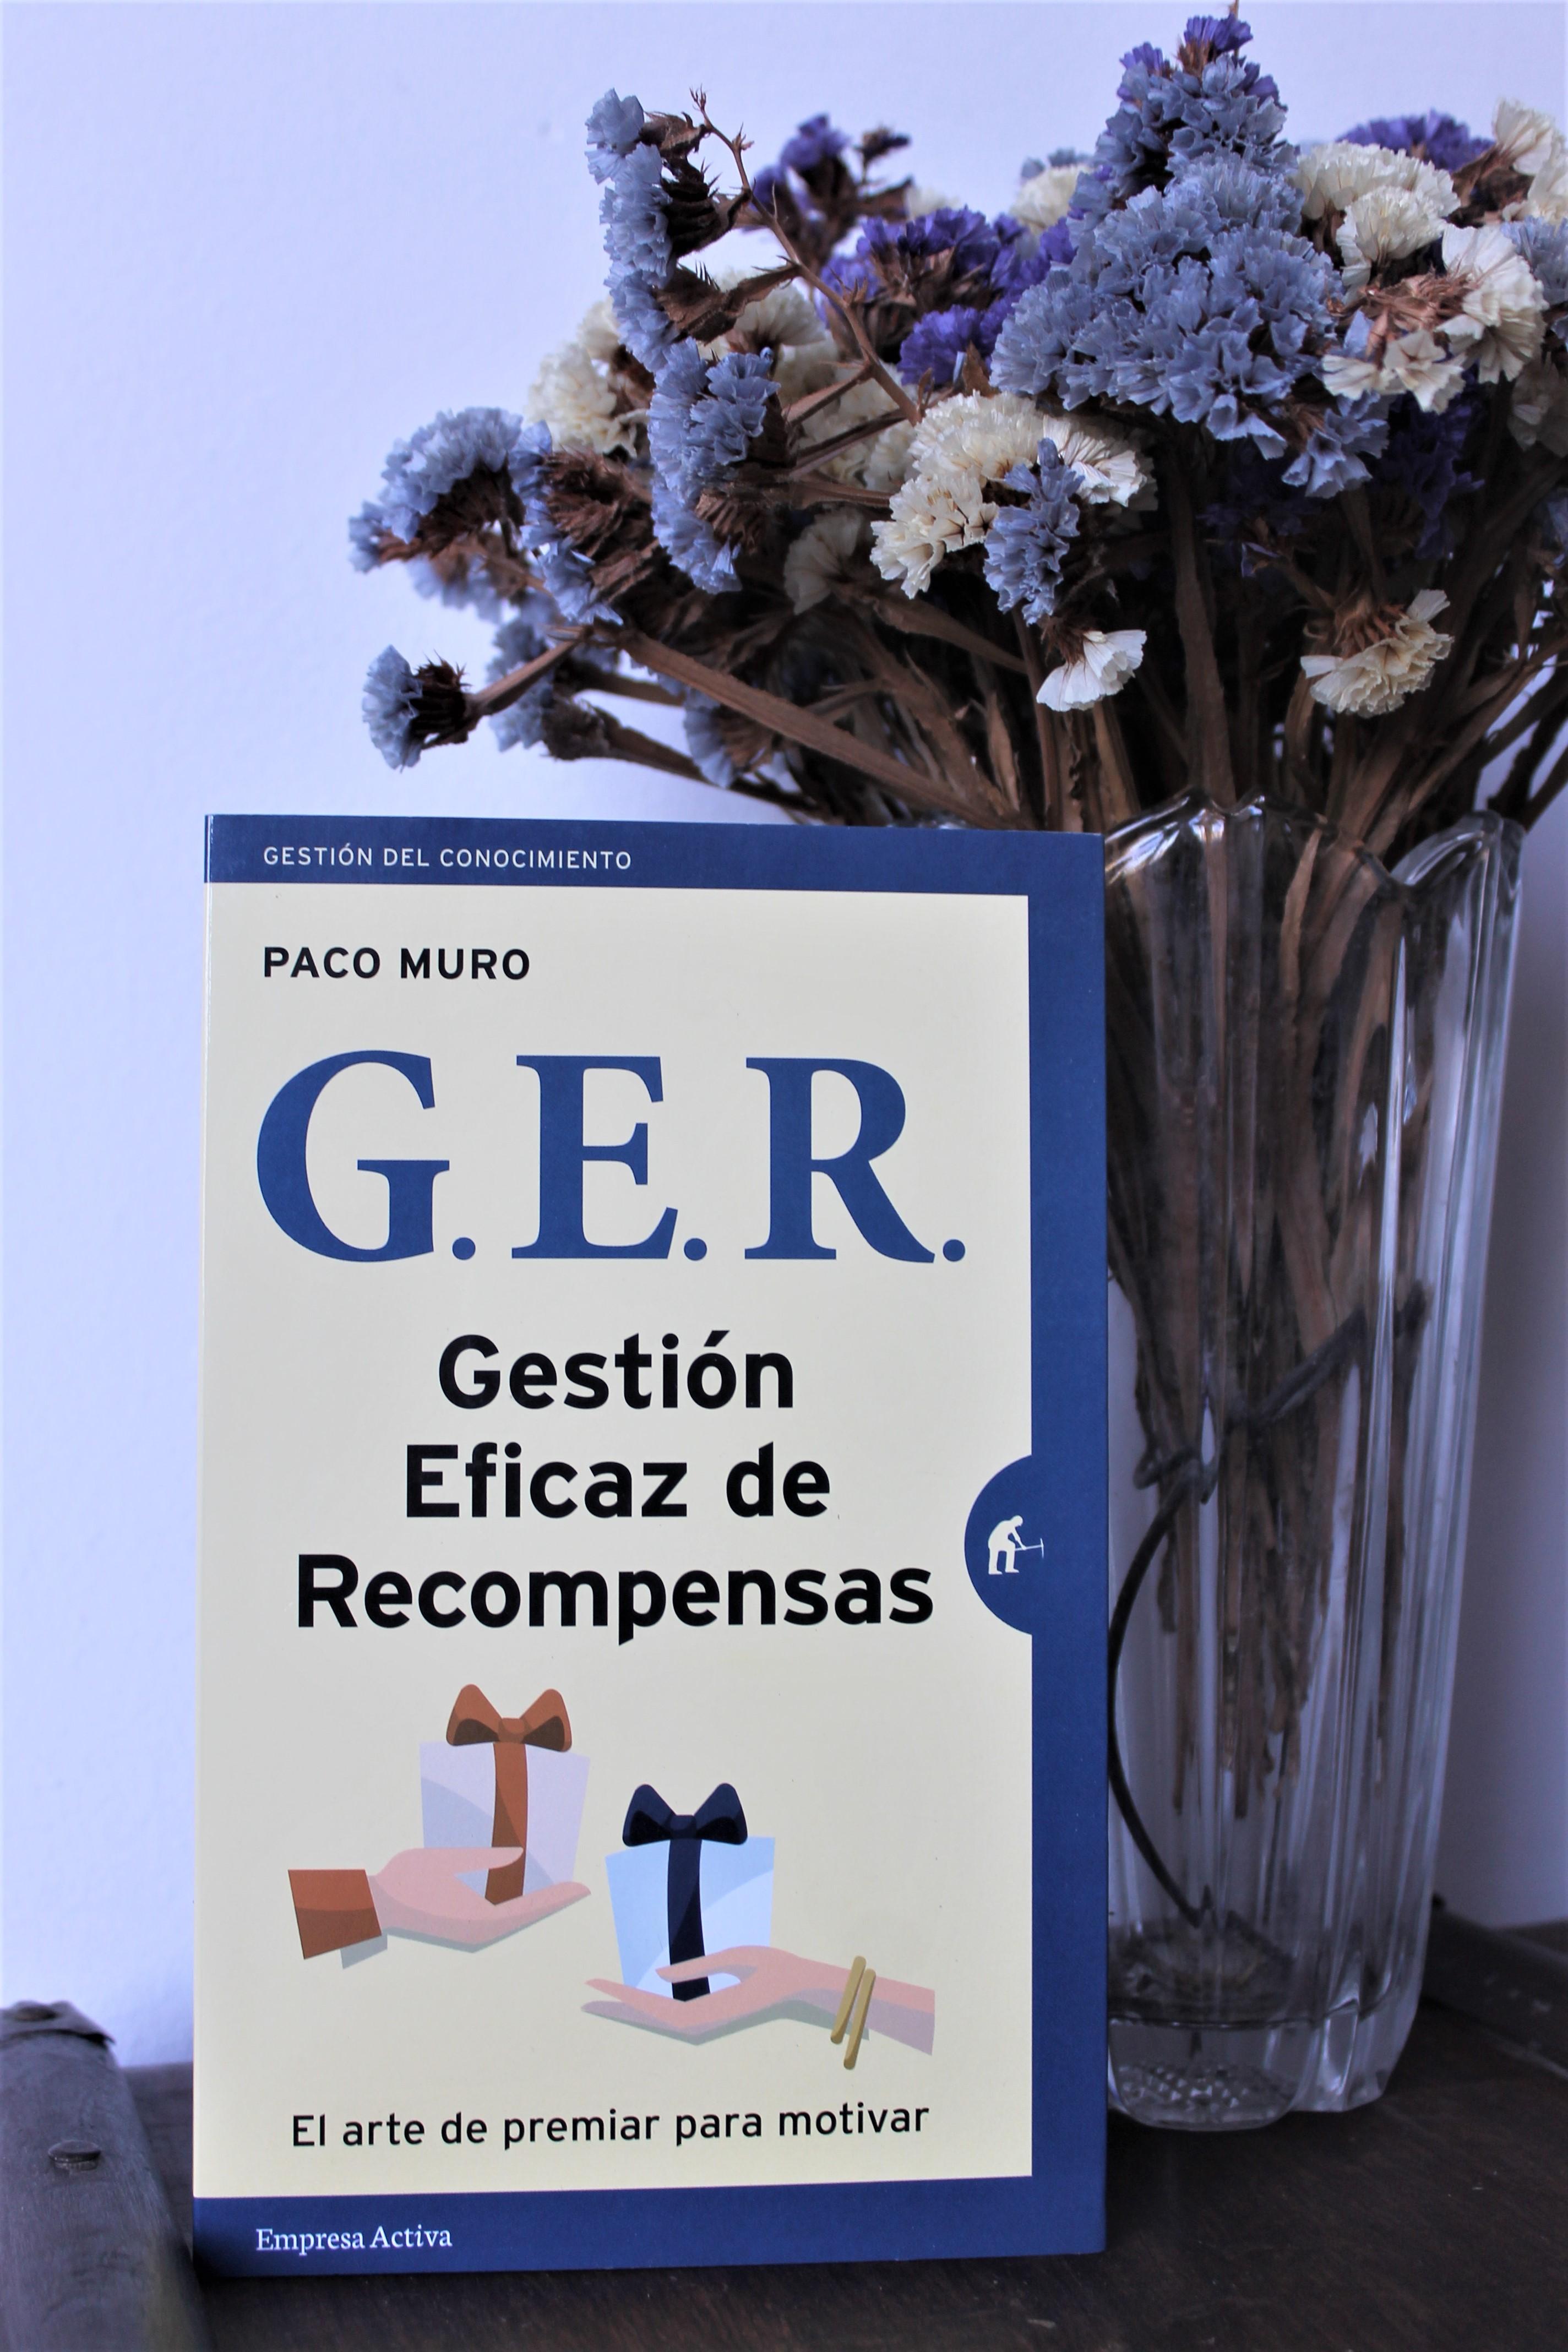 G.E.R. – Paco Muro